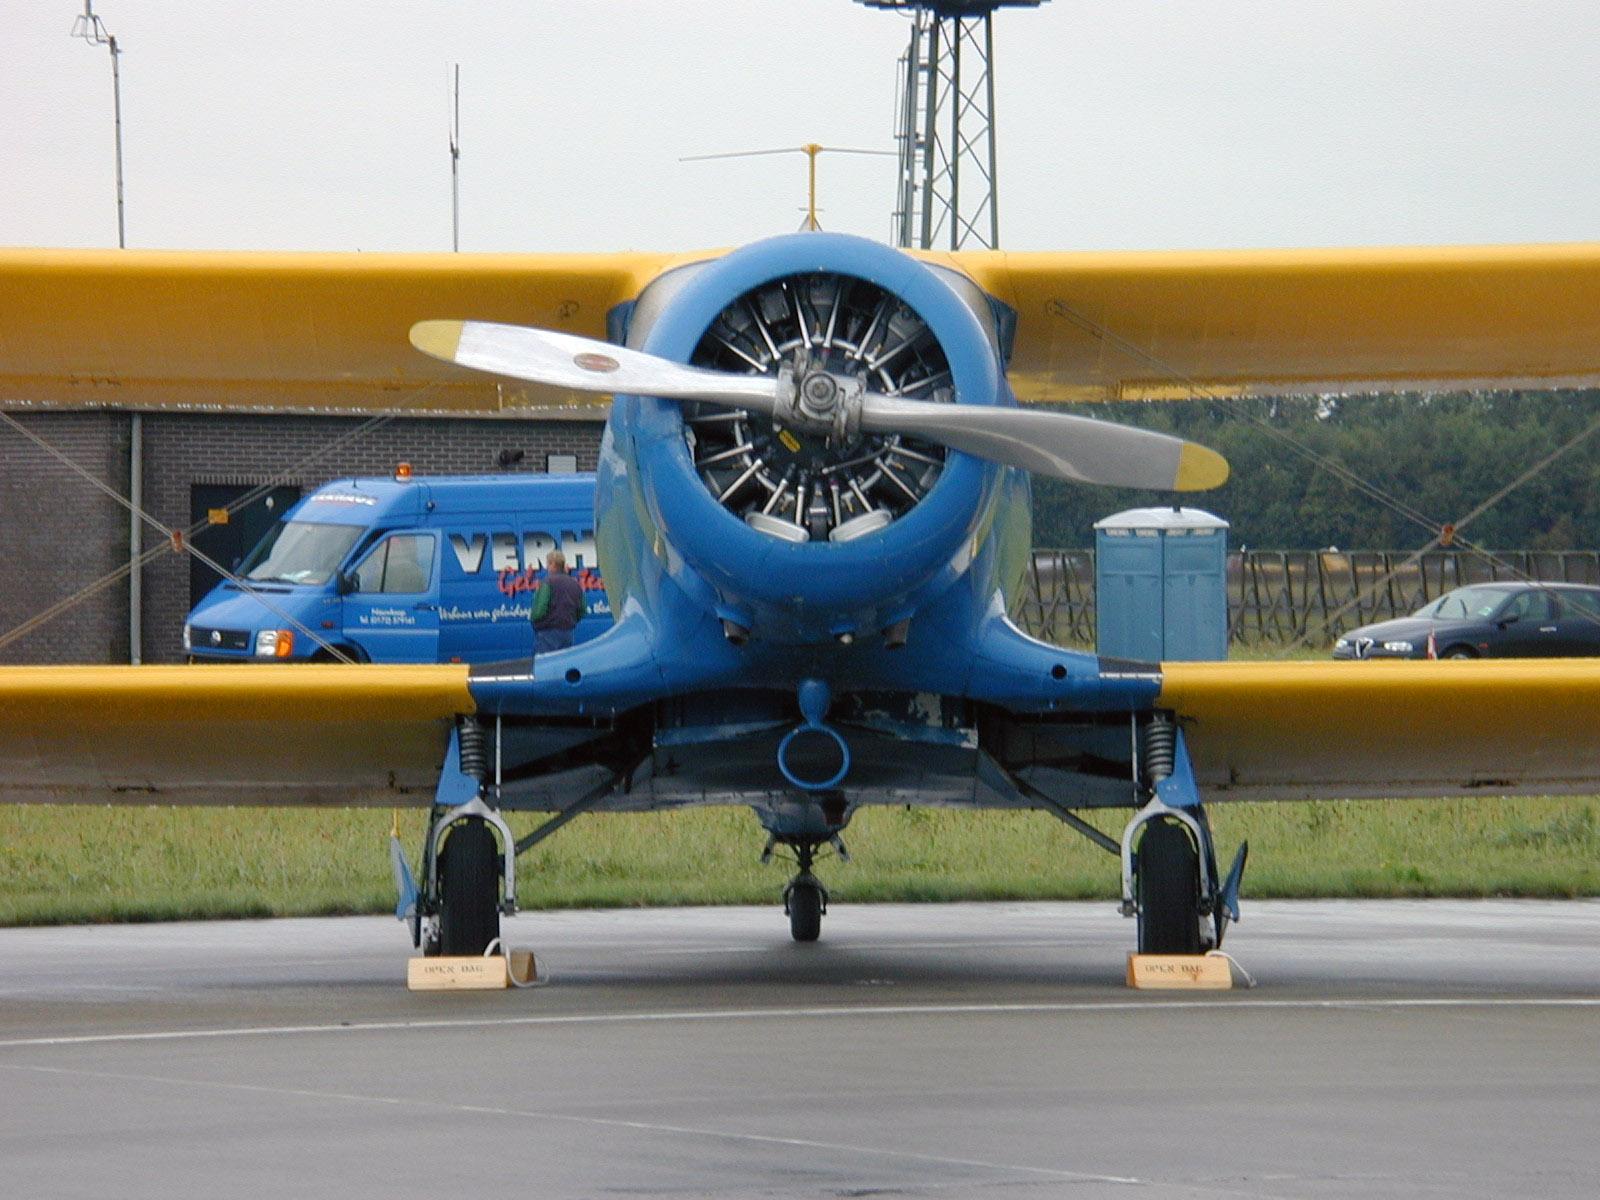 prop propellor twin-decker twin decker yellow blue biplane frontview front engine